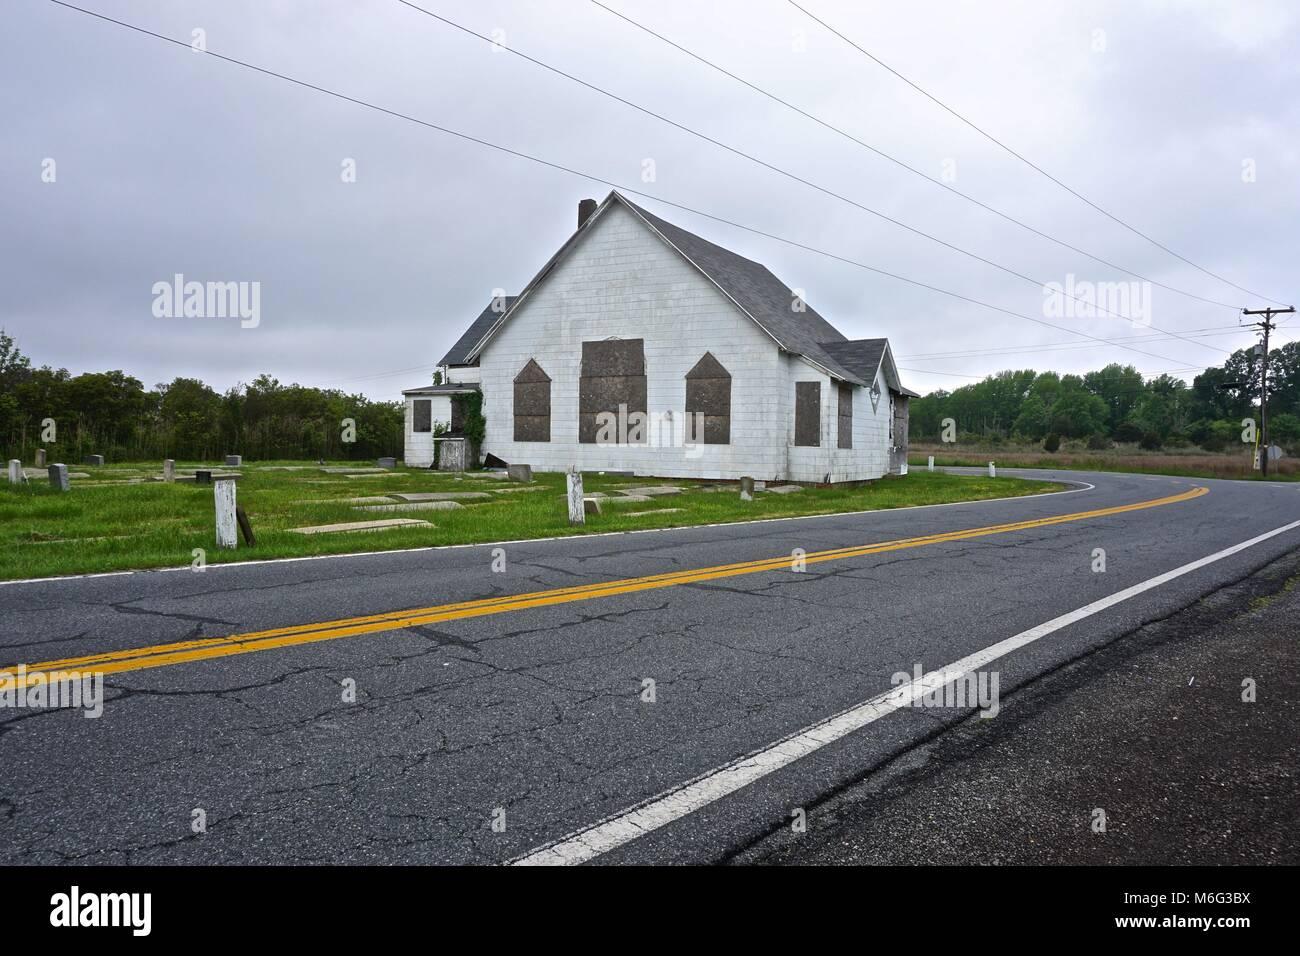 African American Church Community Stock Photos African American Church Community Stock Images